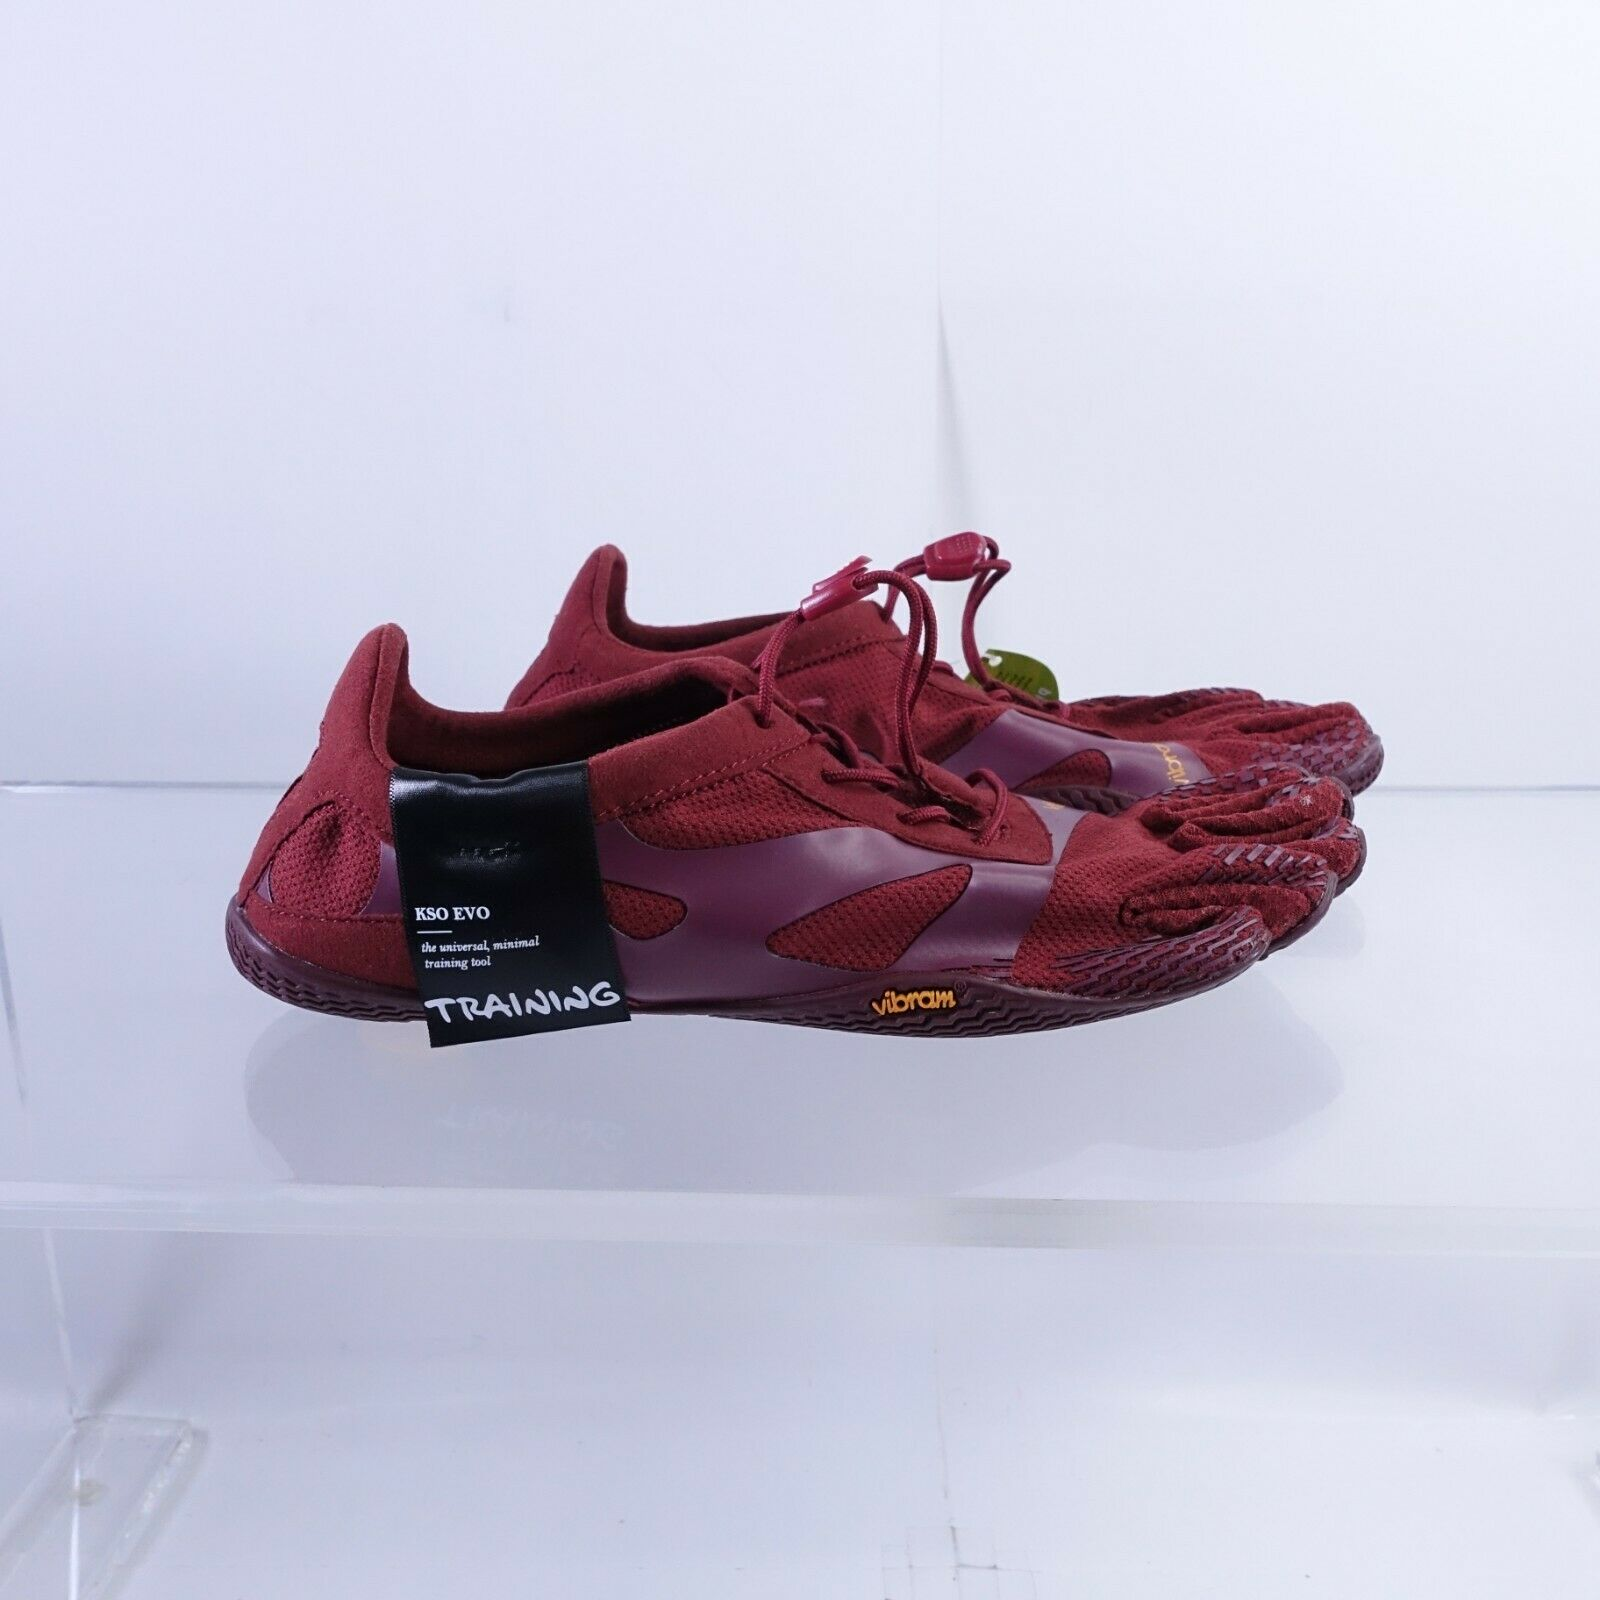 Taille 8.5-9 Femme Vibram Fivefingers Kso Evo Chaussures De Randonnée 19W0702 Bourgogne